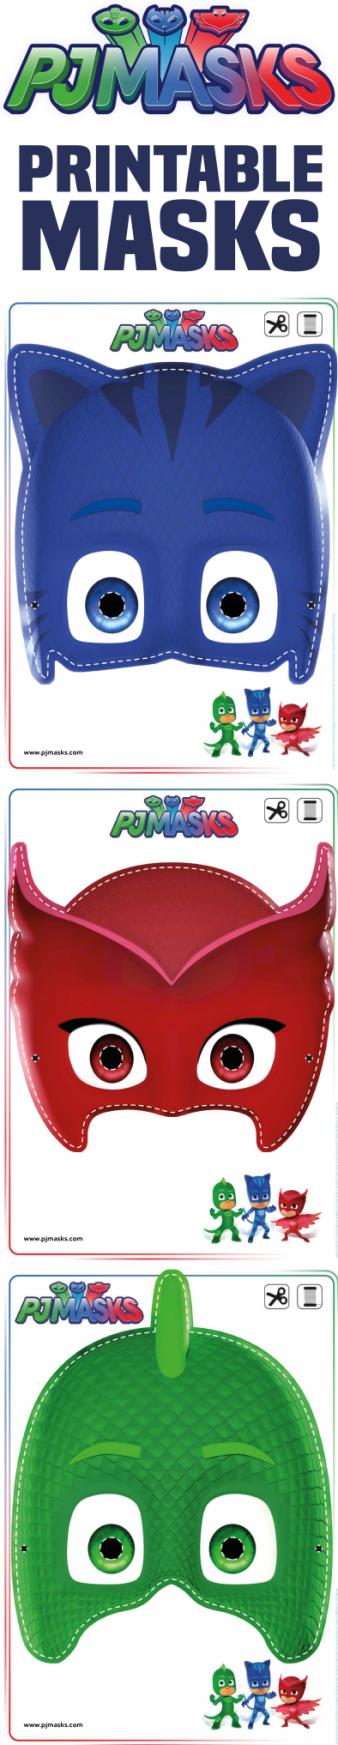 printables pj masks owlette gekko catboy masks invitations